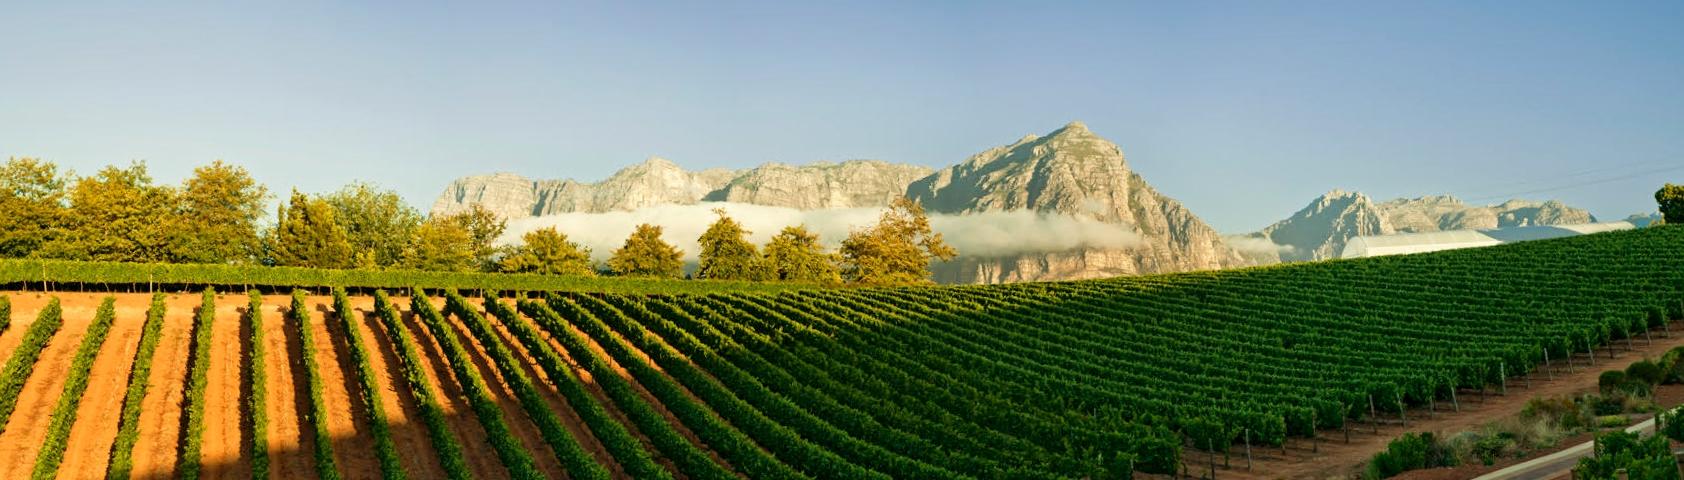 Spectacular views of the vineyards at Stellenbosch